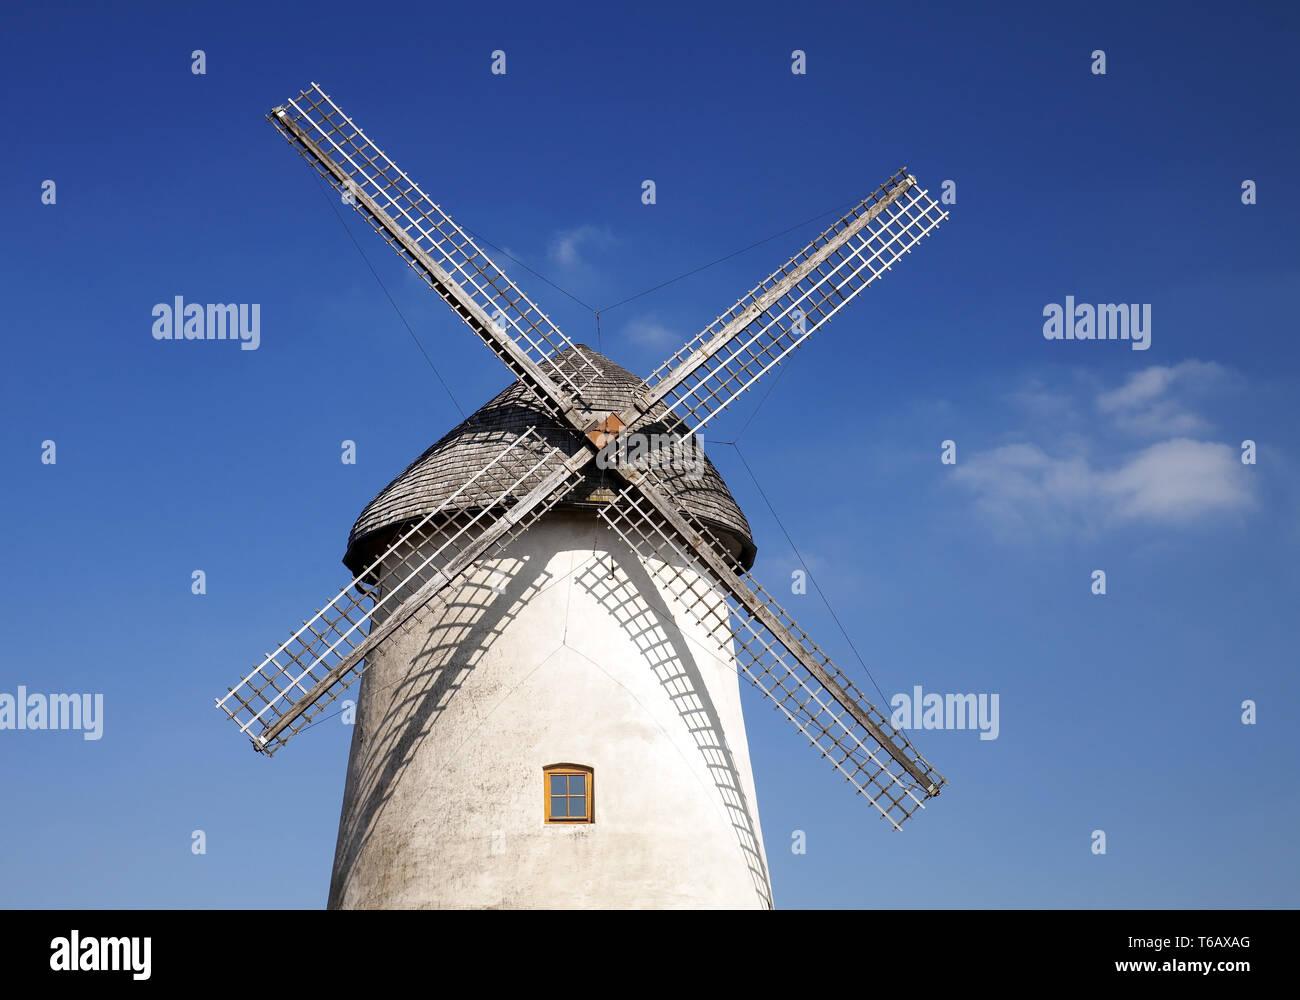 wind mill, Enningerloh, Muensterland, North Rhine-Westphalia, Germany - Stock Image